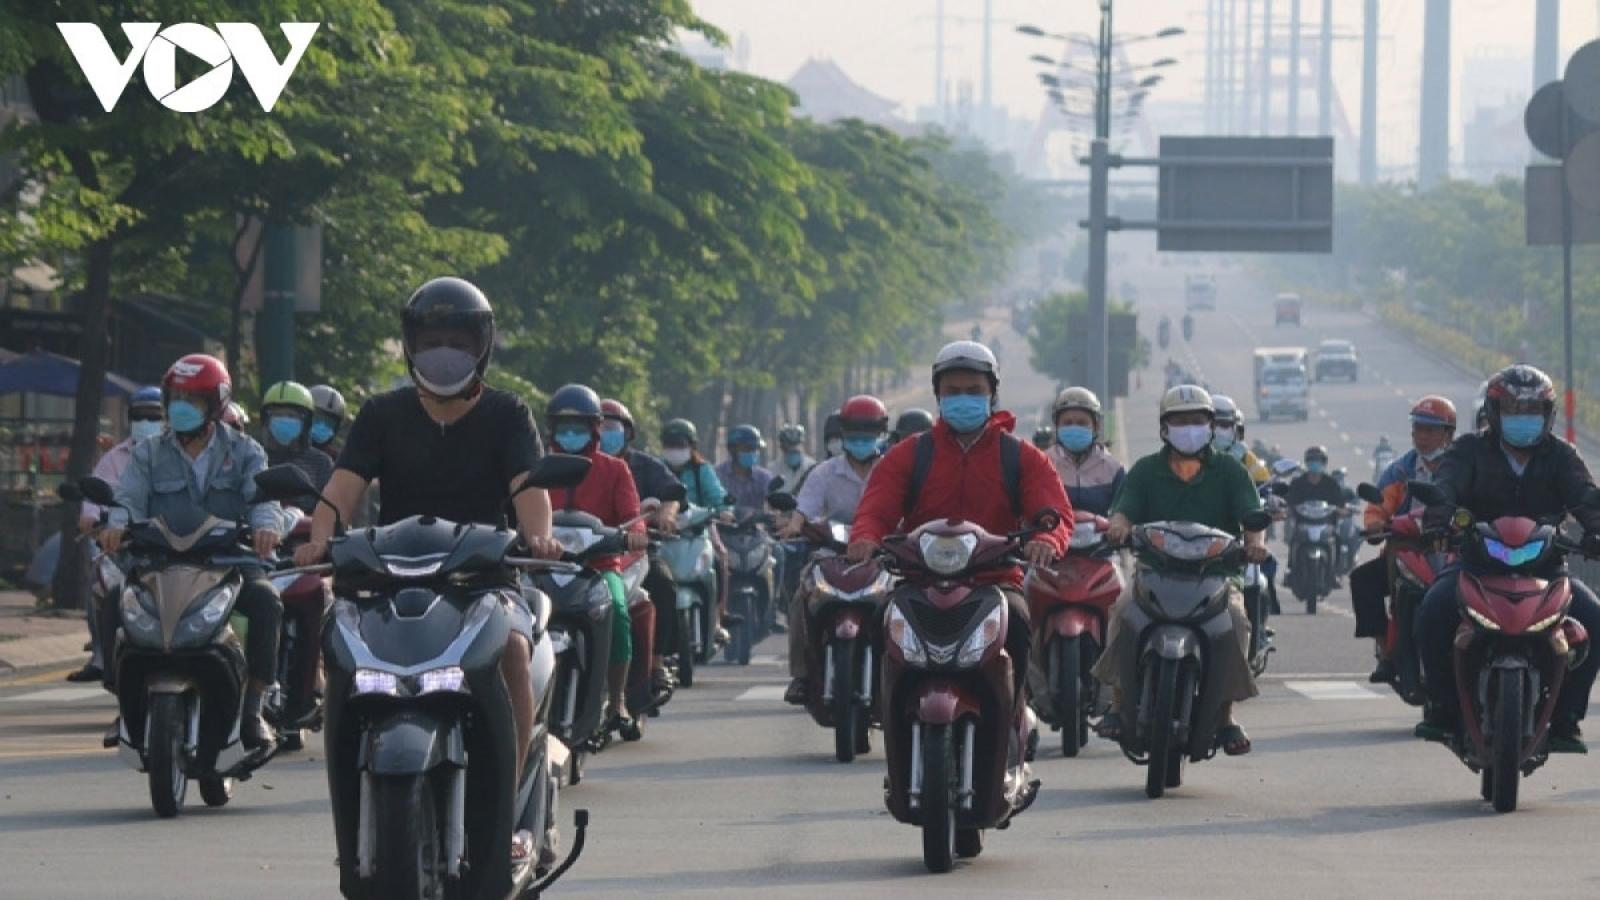 Four local COVID-19 alert levels in Vietnam